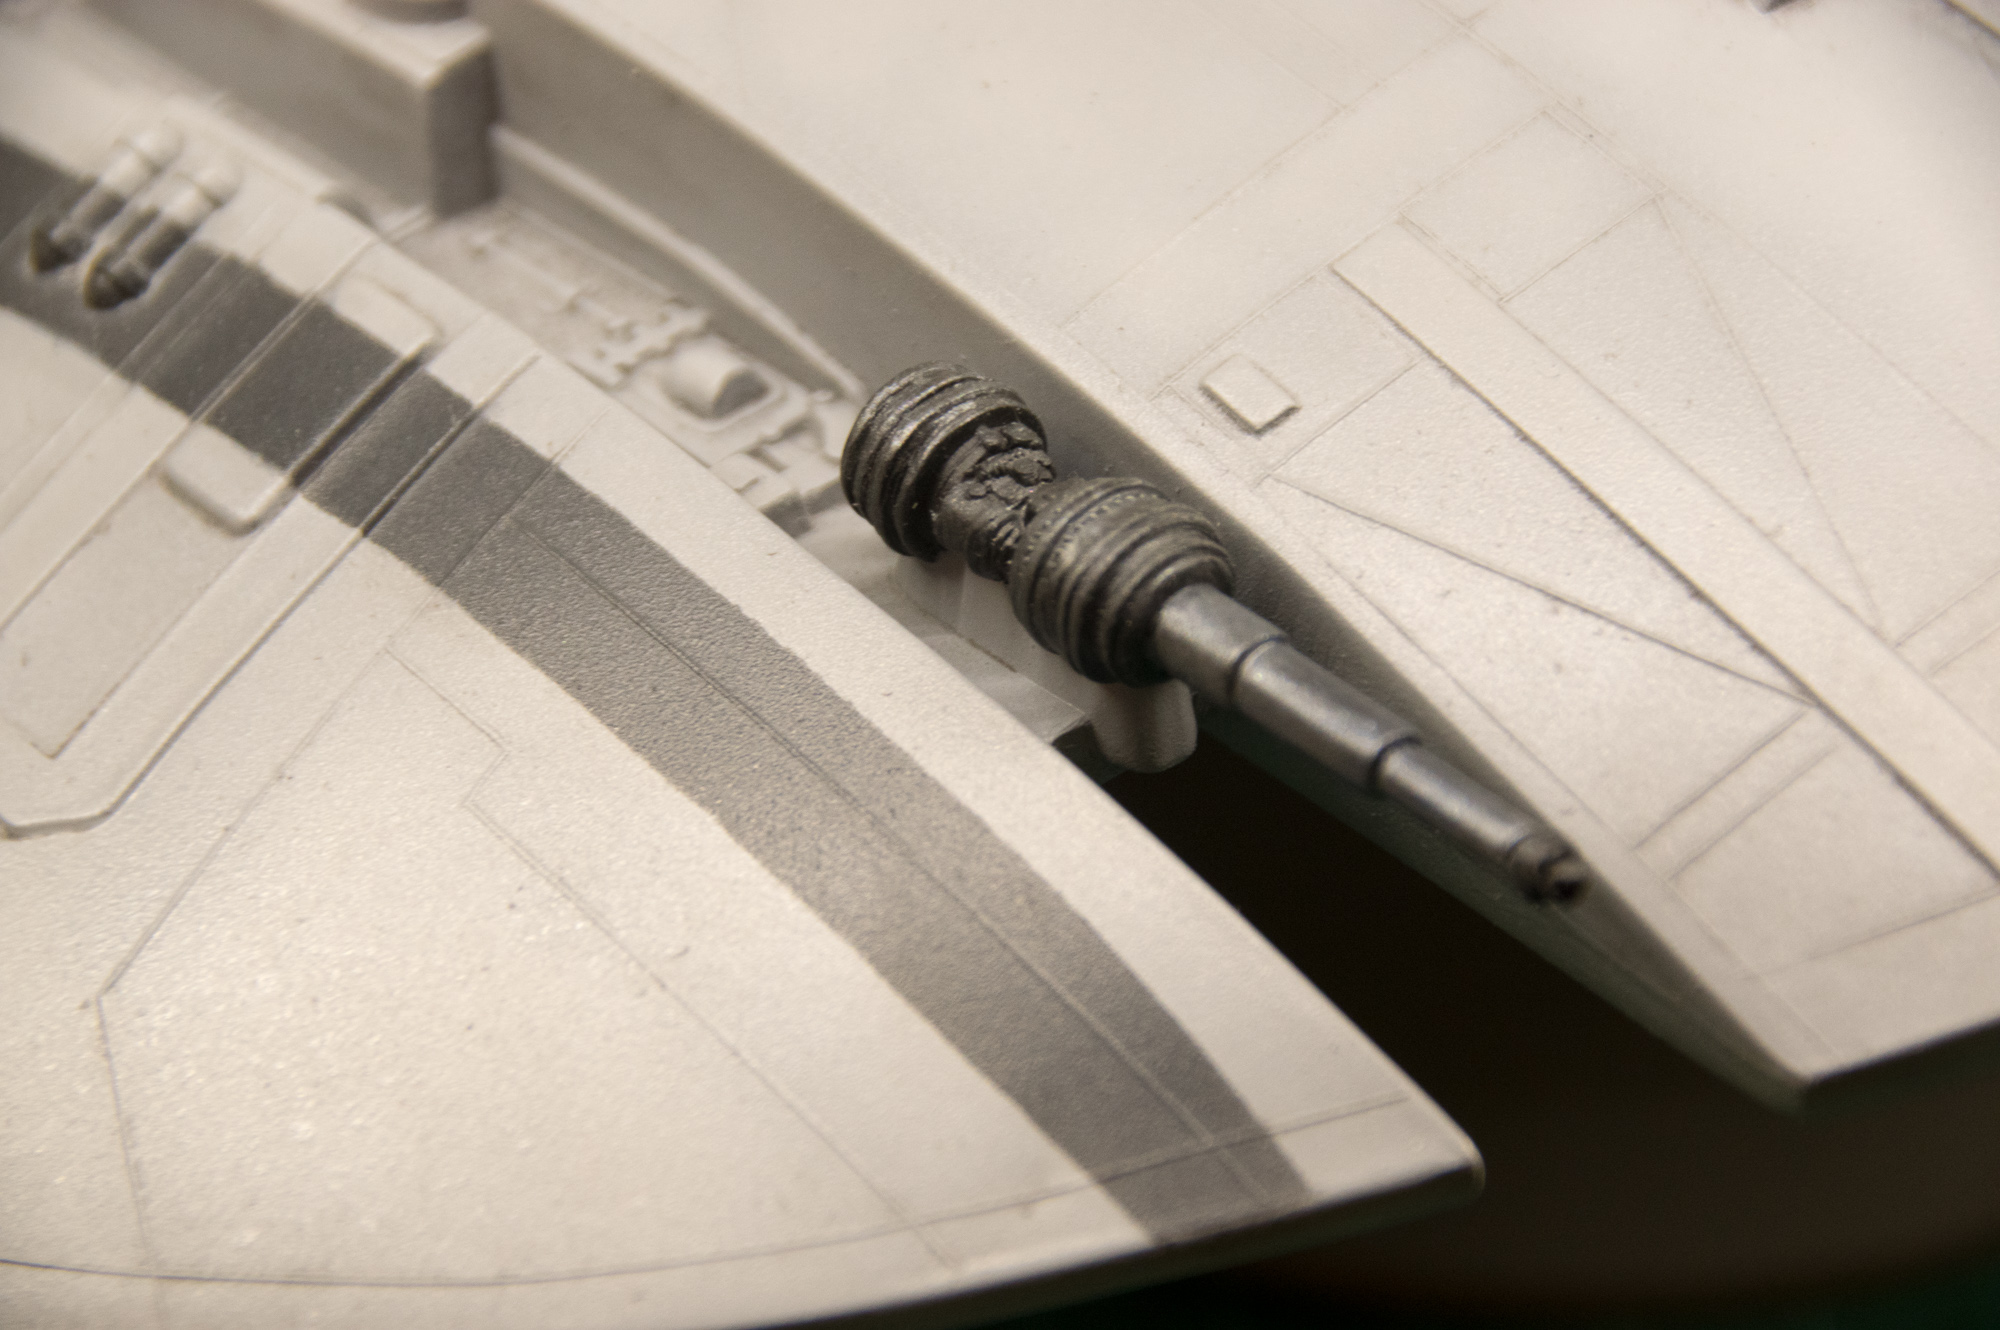 Chasseur Cylon - Galactica 190317072115105926